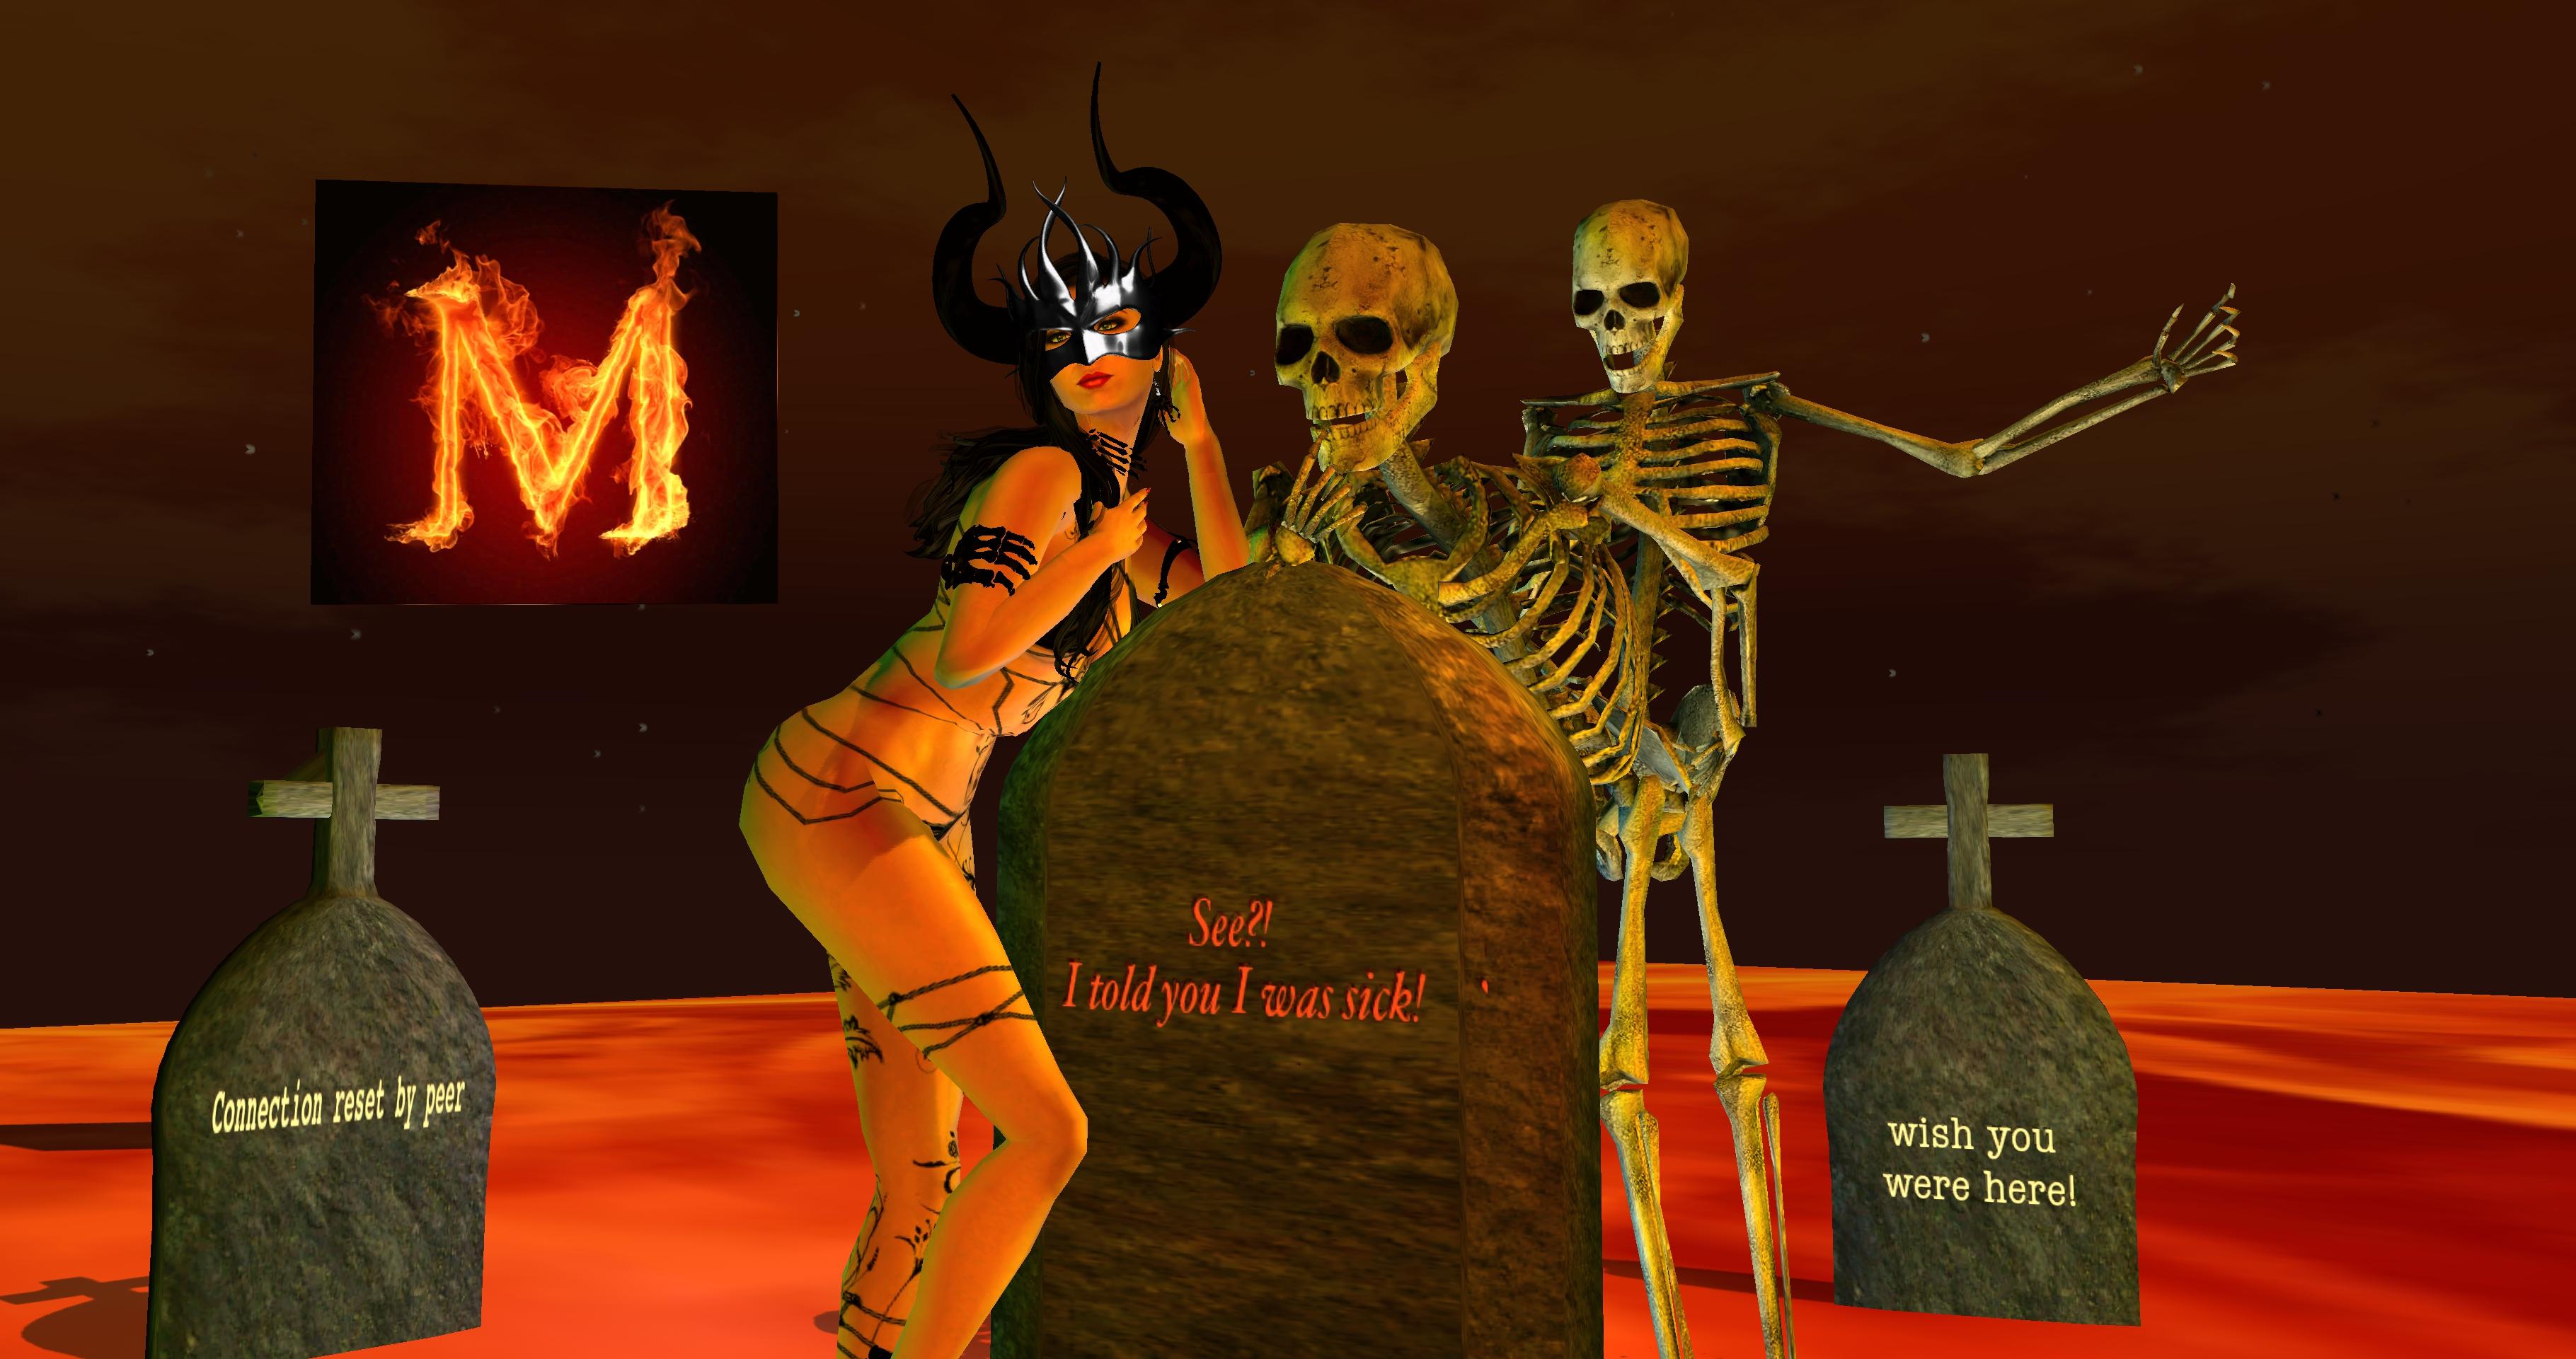 wallpaper 3d halloween mask horns cgi devil bones october